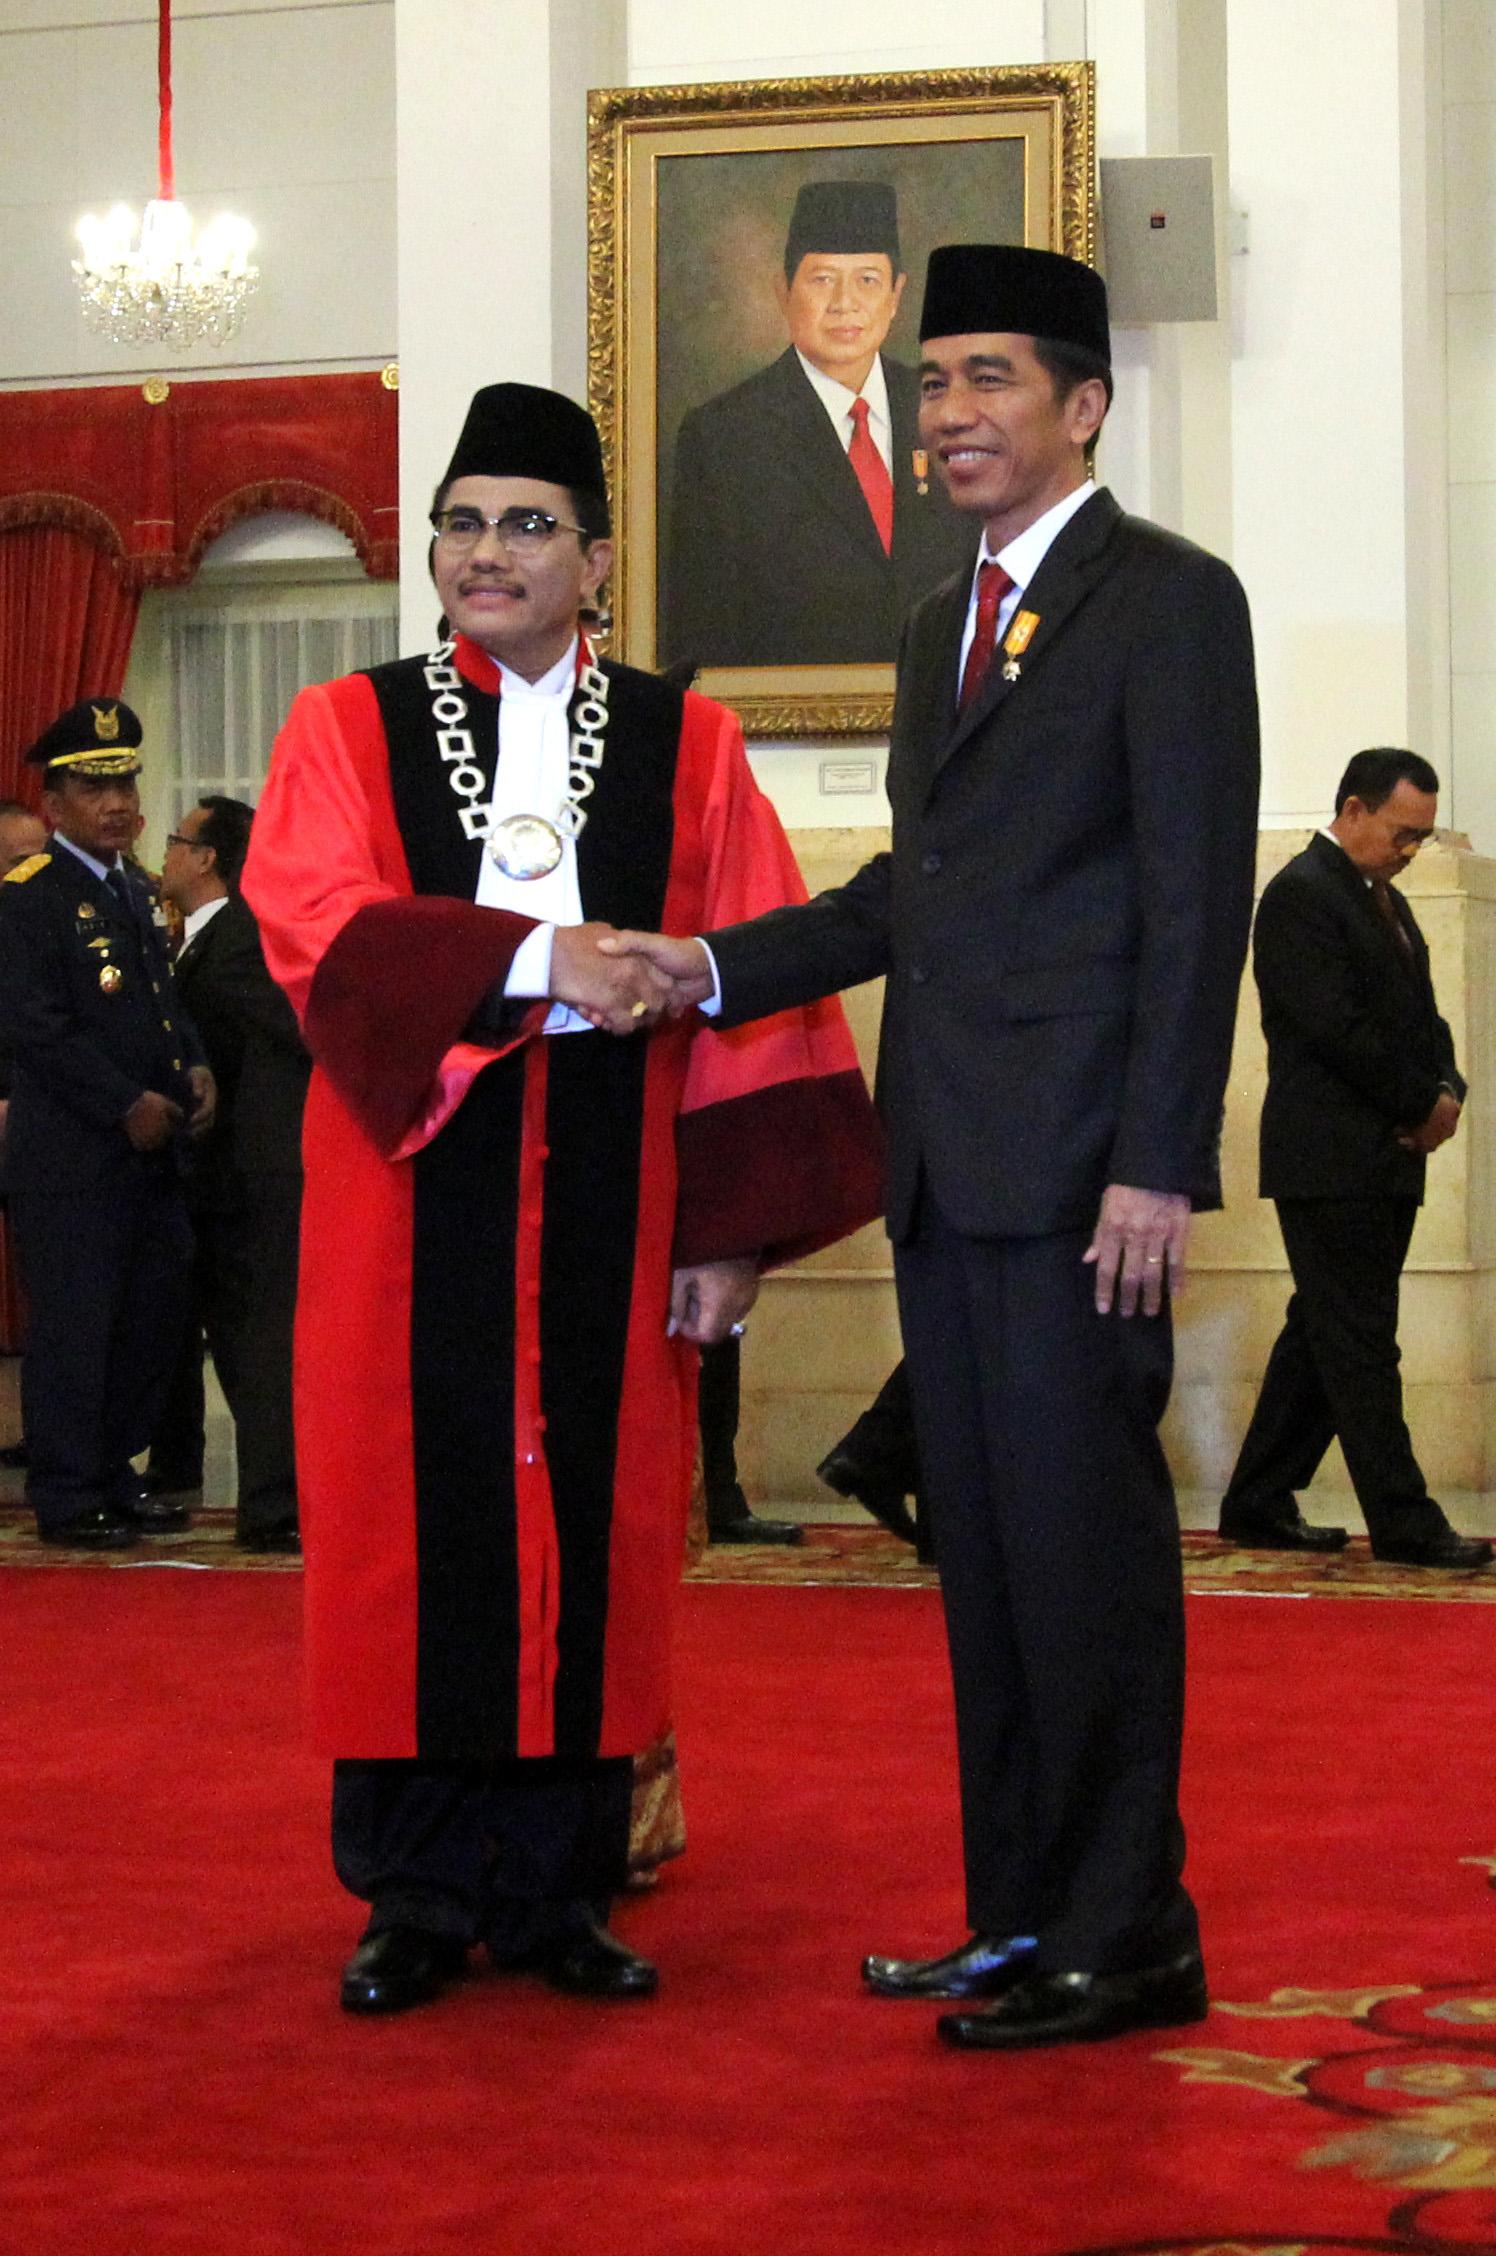 Ketua Hakim Konstitusi Manahan Sitompul bersama Presiden Joko Widodo